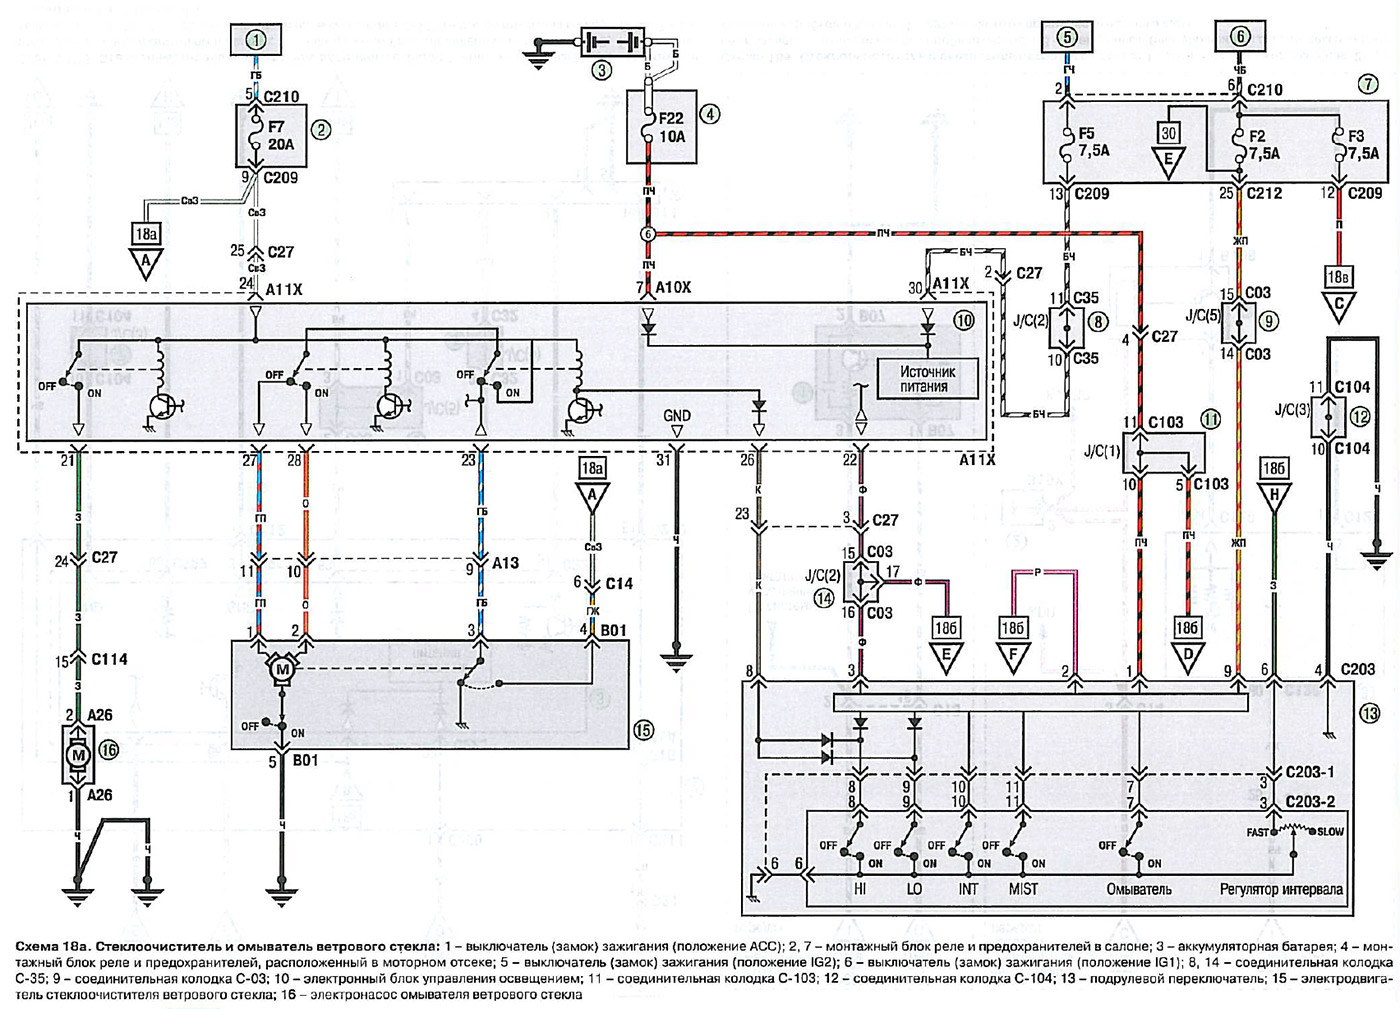 Схема электрооборудования мицубиси лансер фото 330